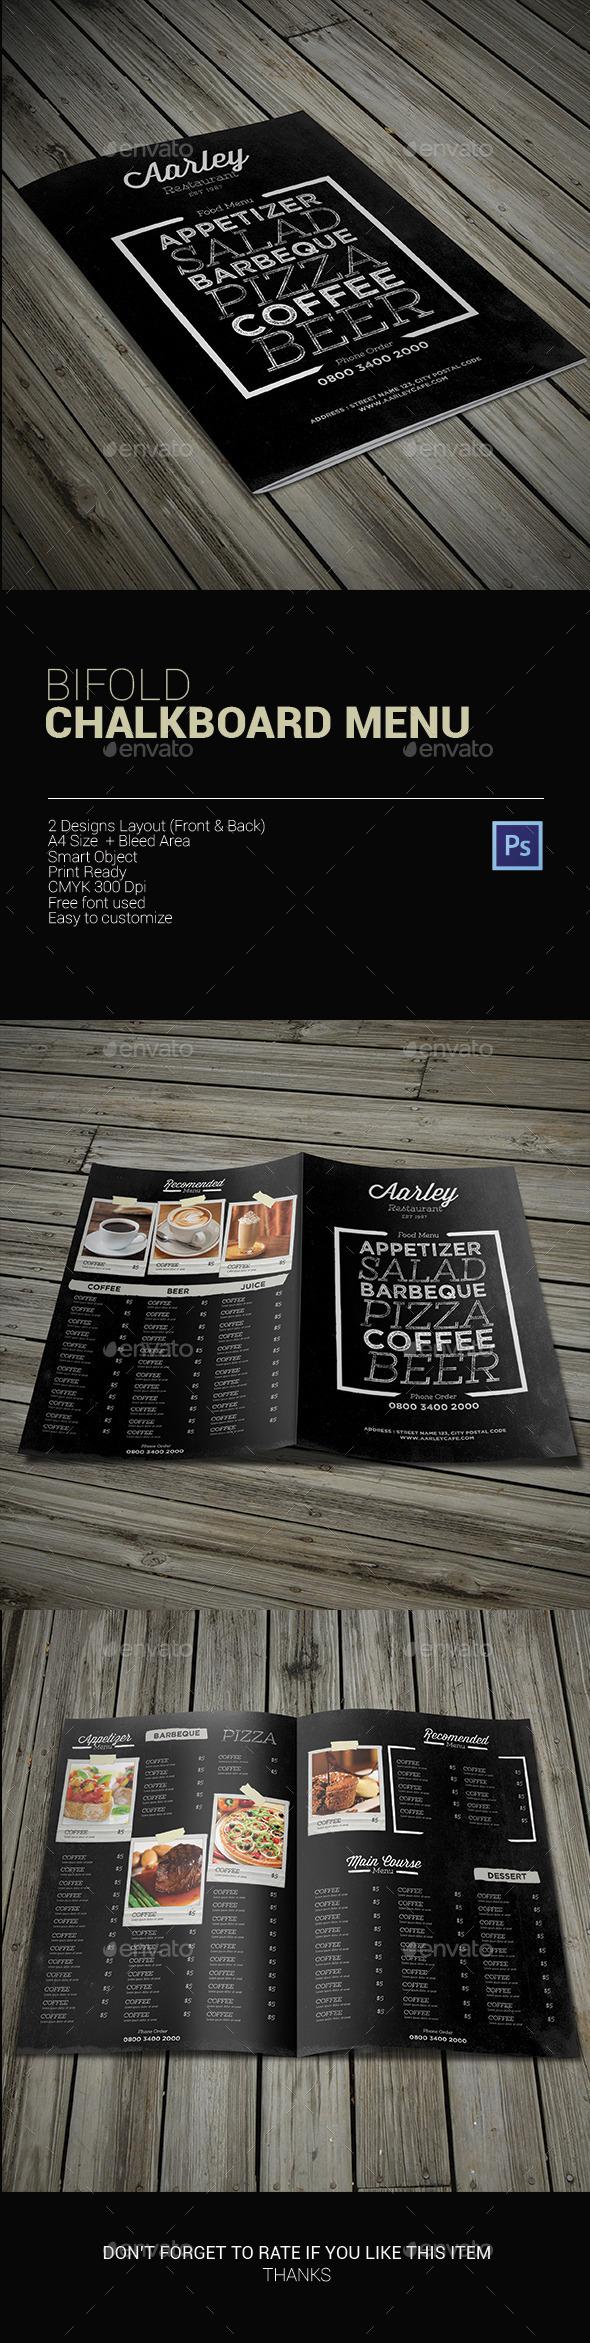 GraphicRiver Bifold Chalkboard Menu 9937083